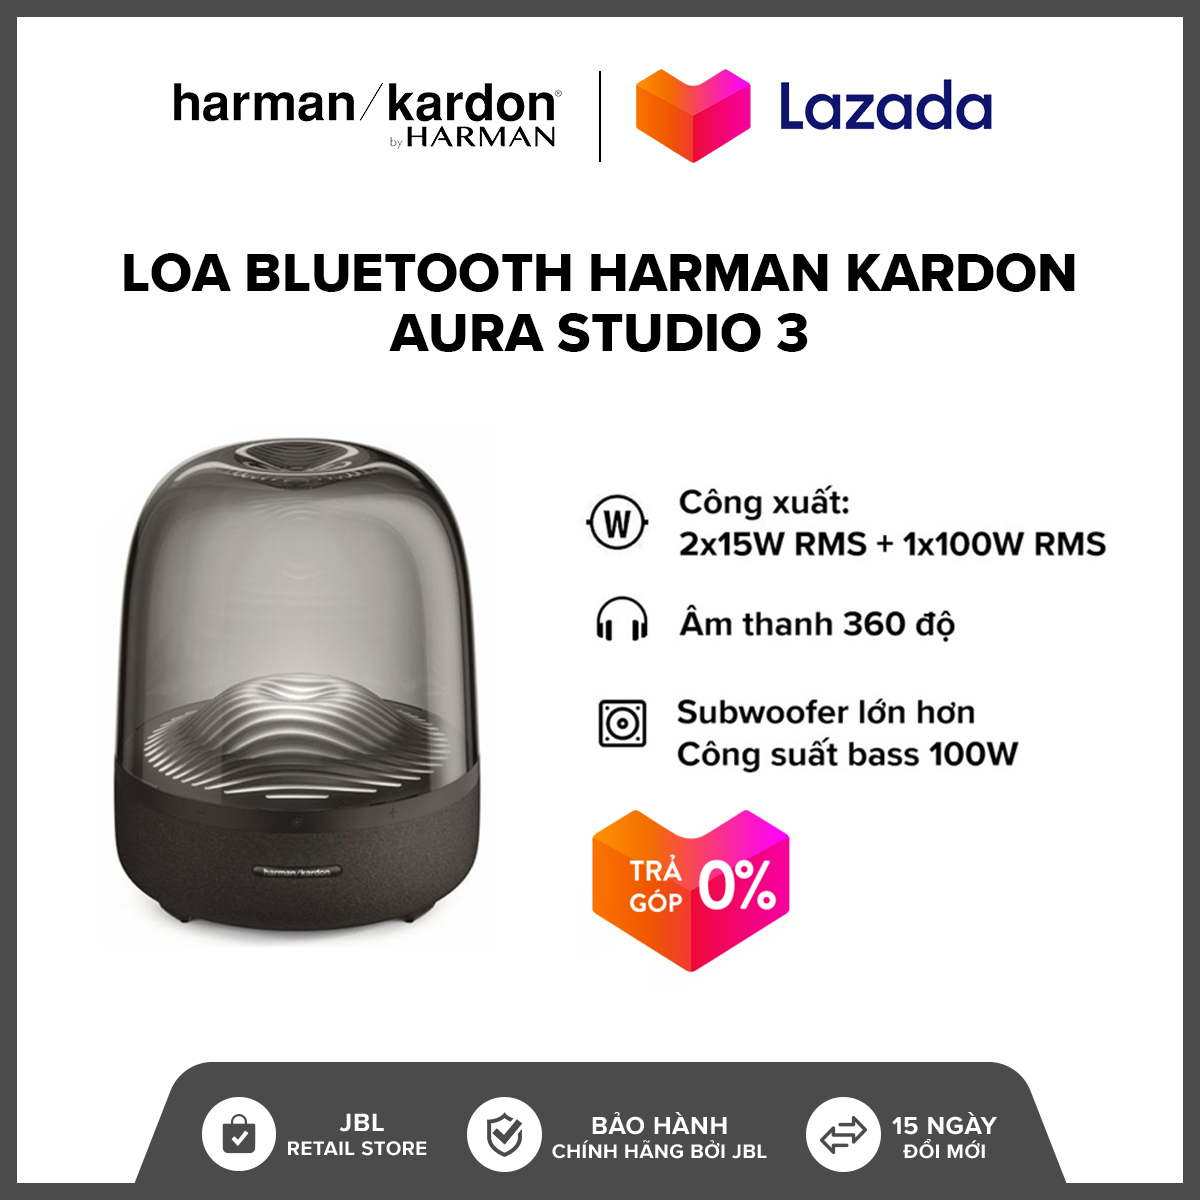 [TRẢ GÓP 0%] Loa Bluetooth Harman Kardon Aura Studio 3 l Công suất: 2 x 15W RMS + 1 x 100W RMS l 45Hz-20kHz l Bluetooth 4.2